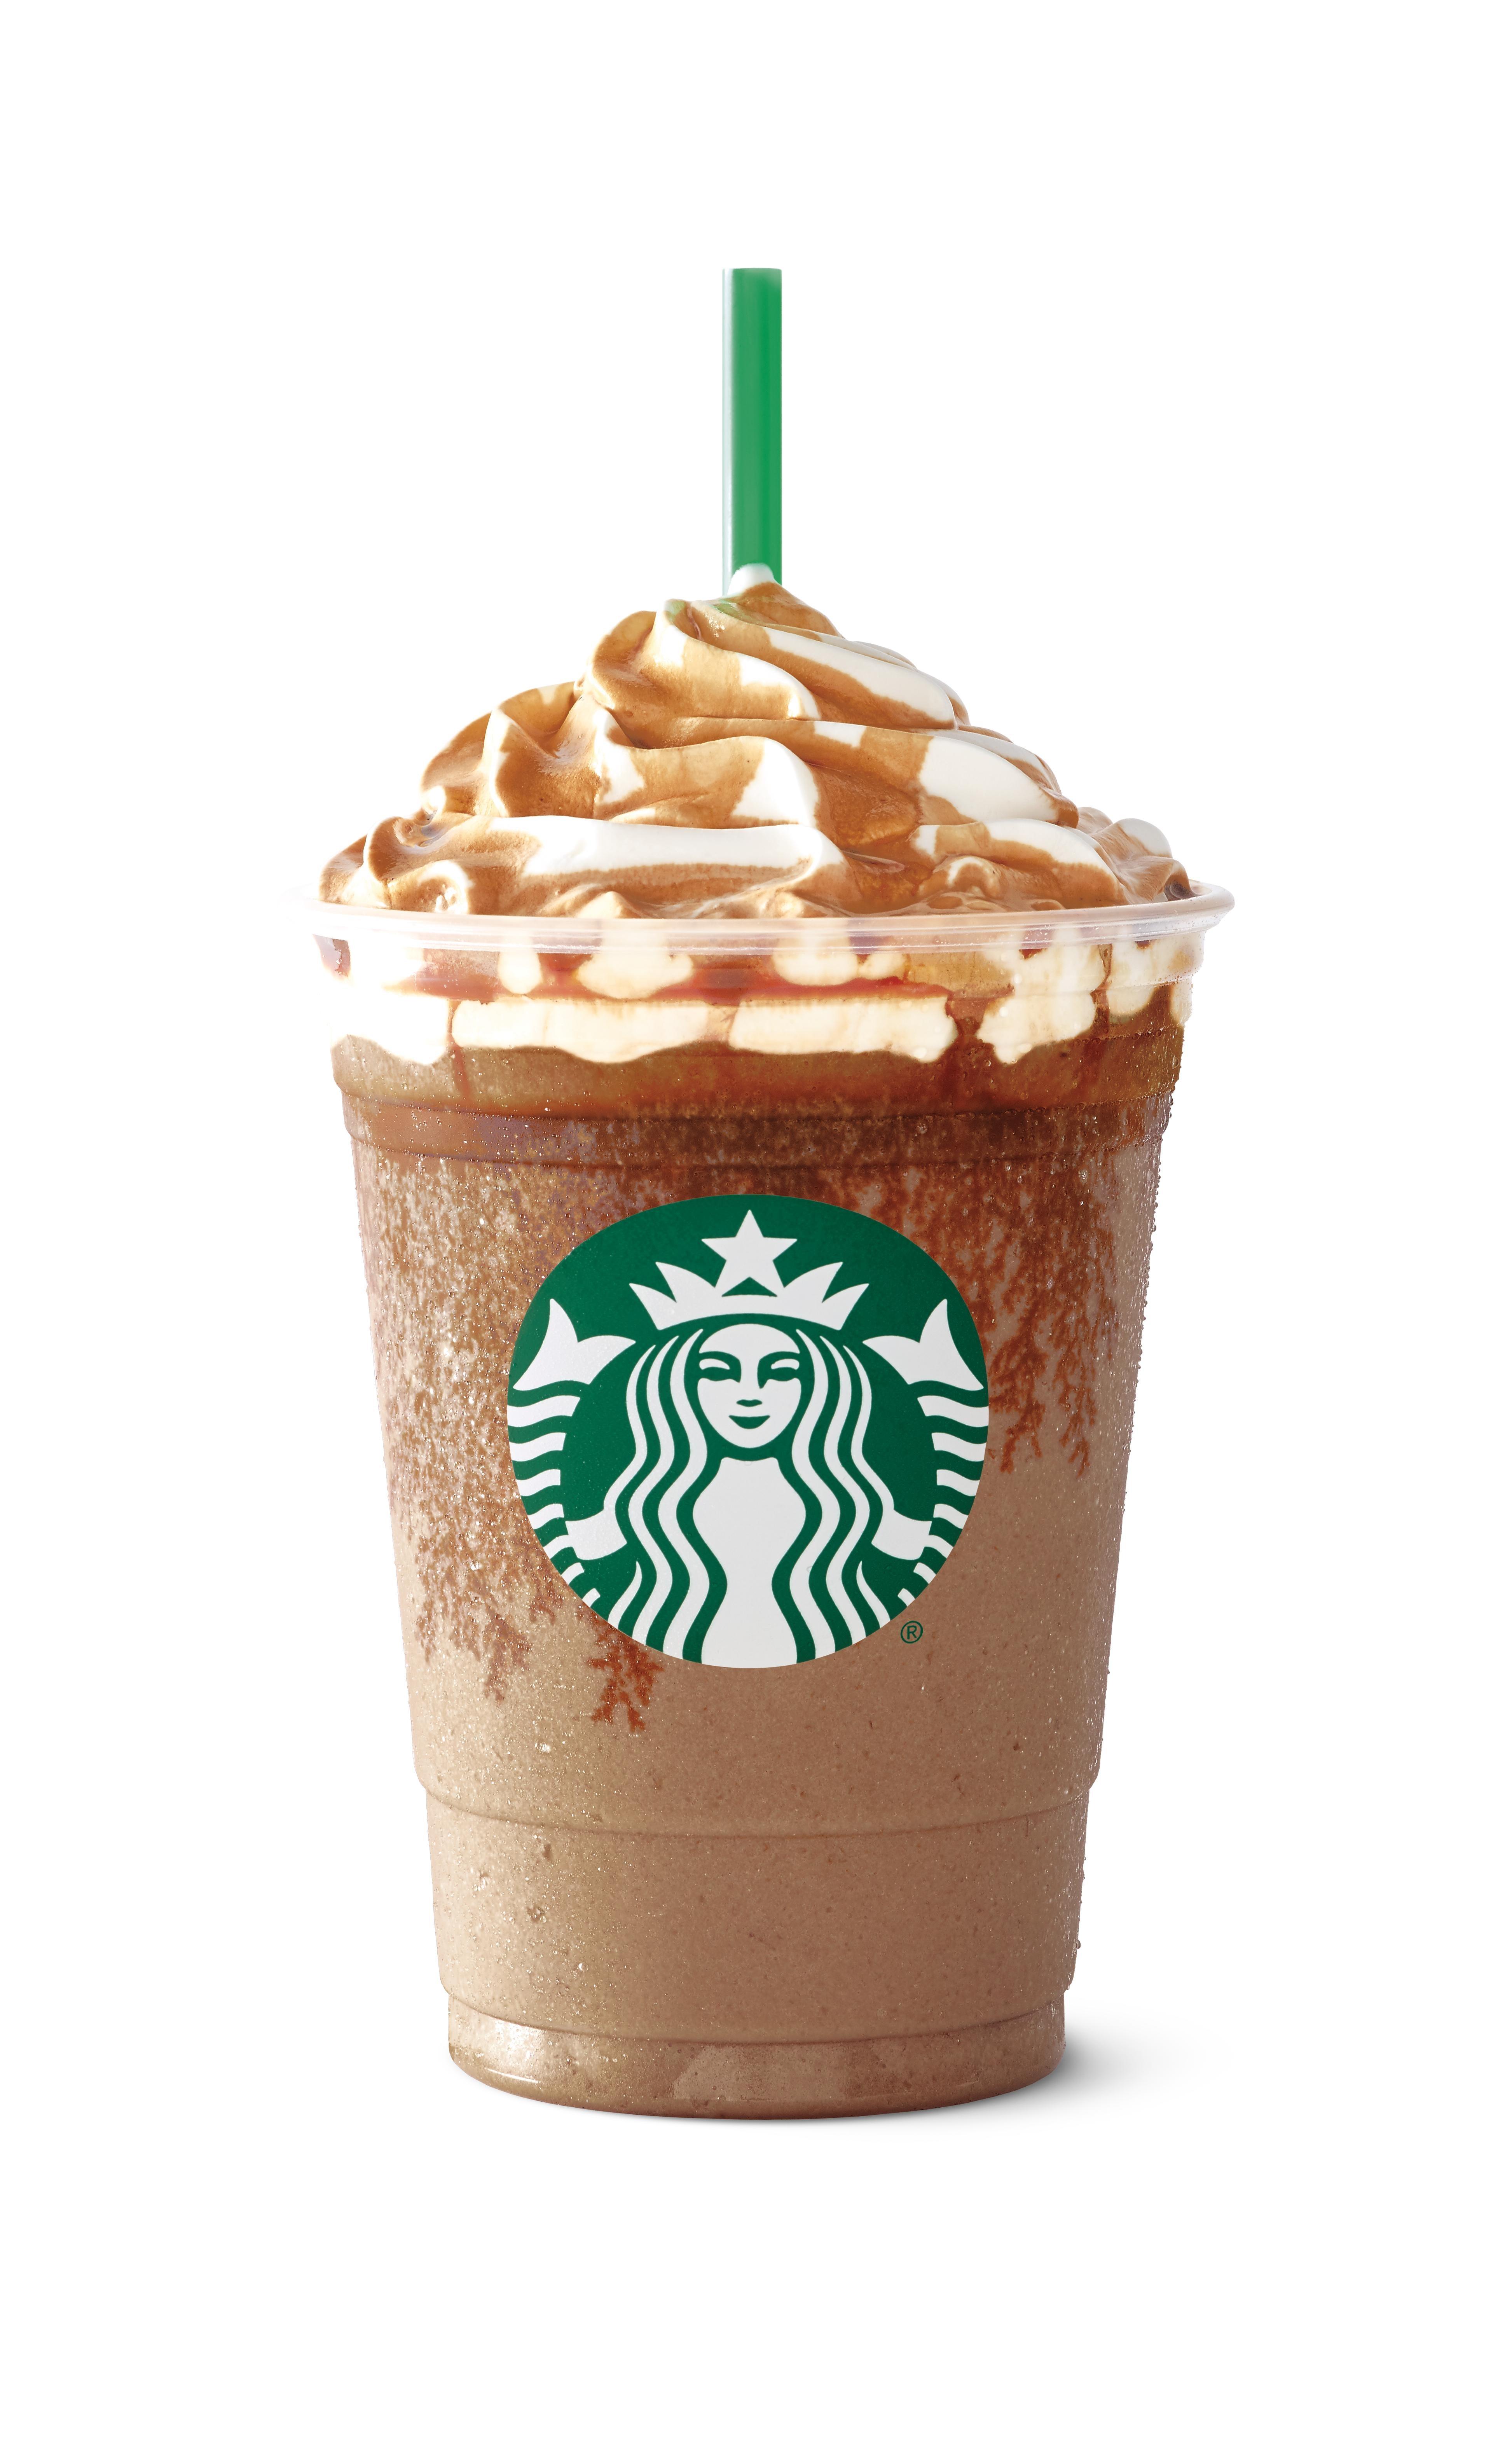 Starbucks Salted Caramel Mocha Frappuccino Light Calories